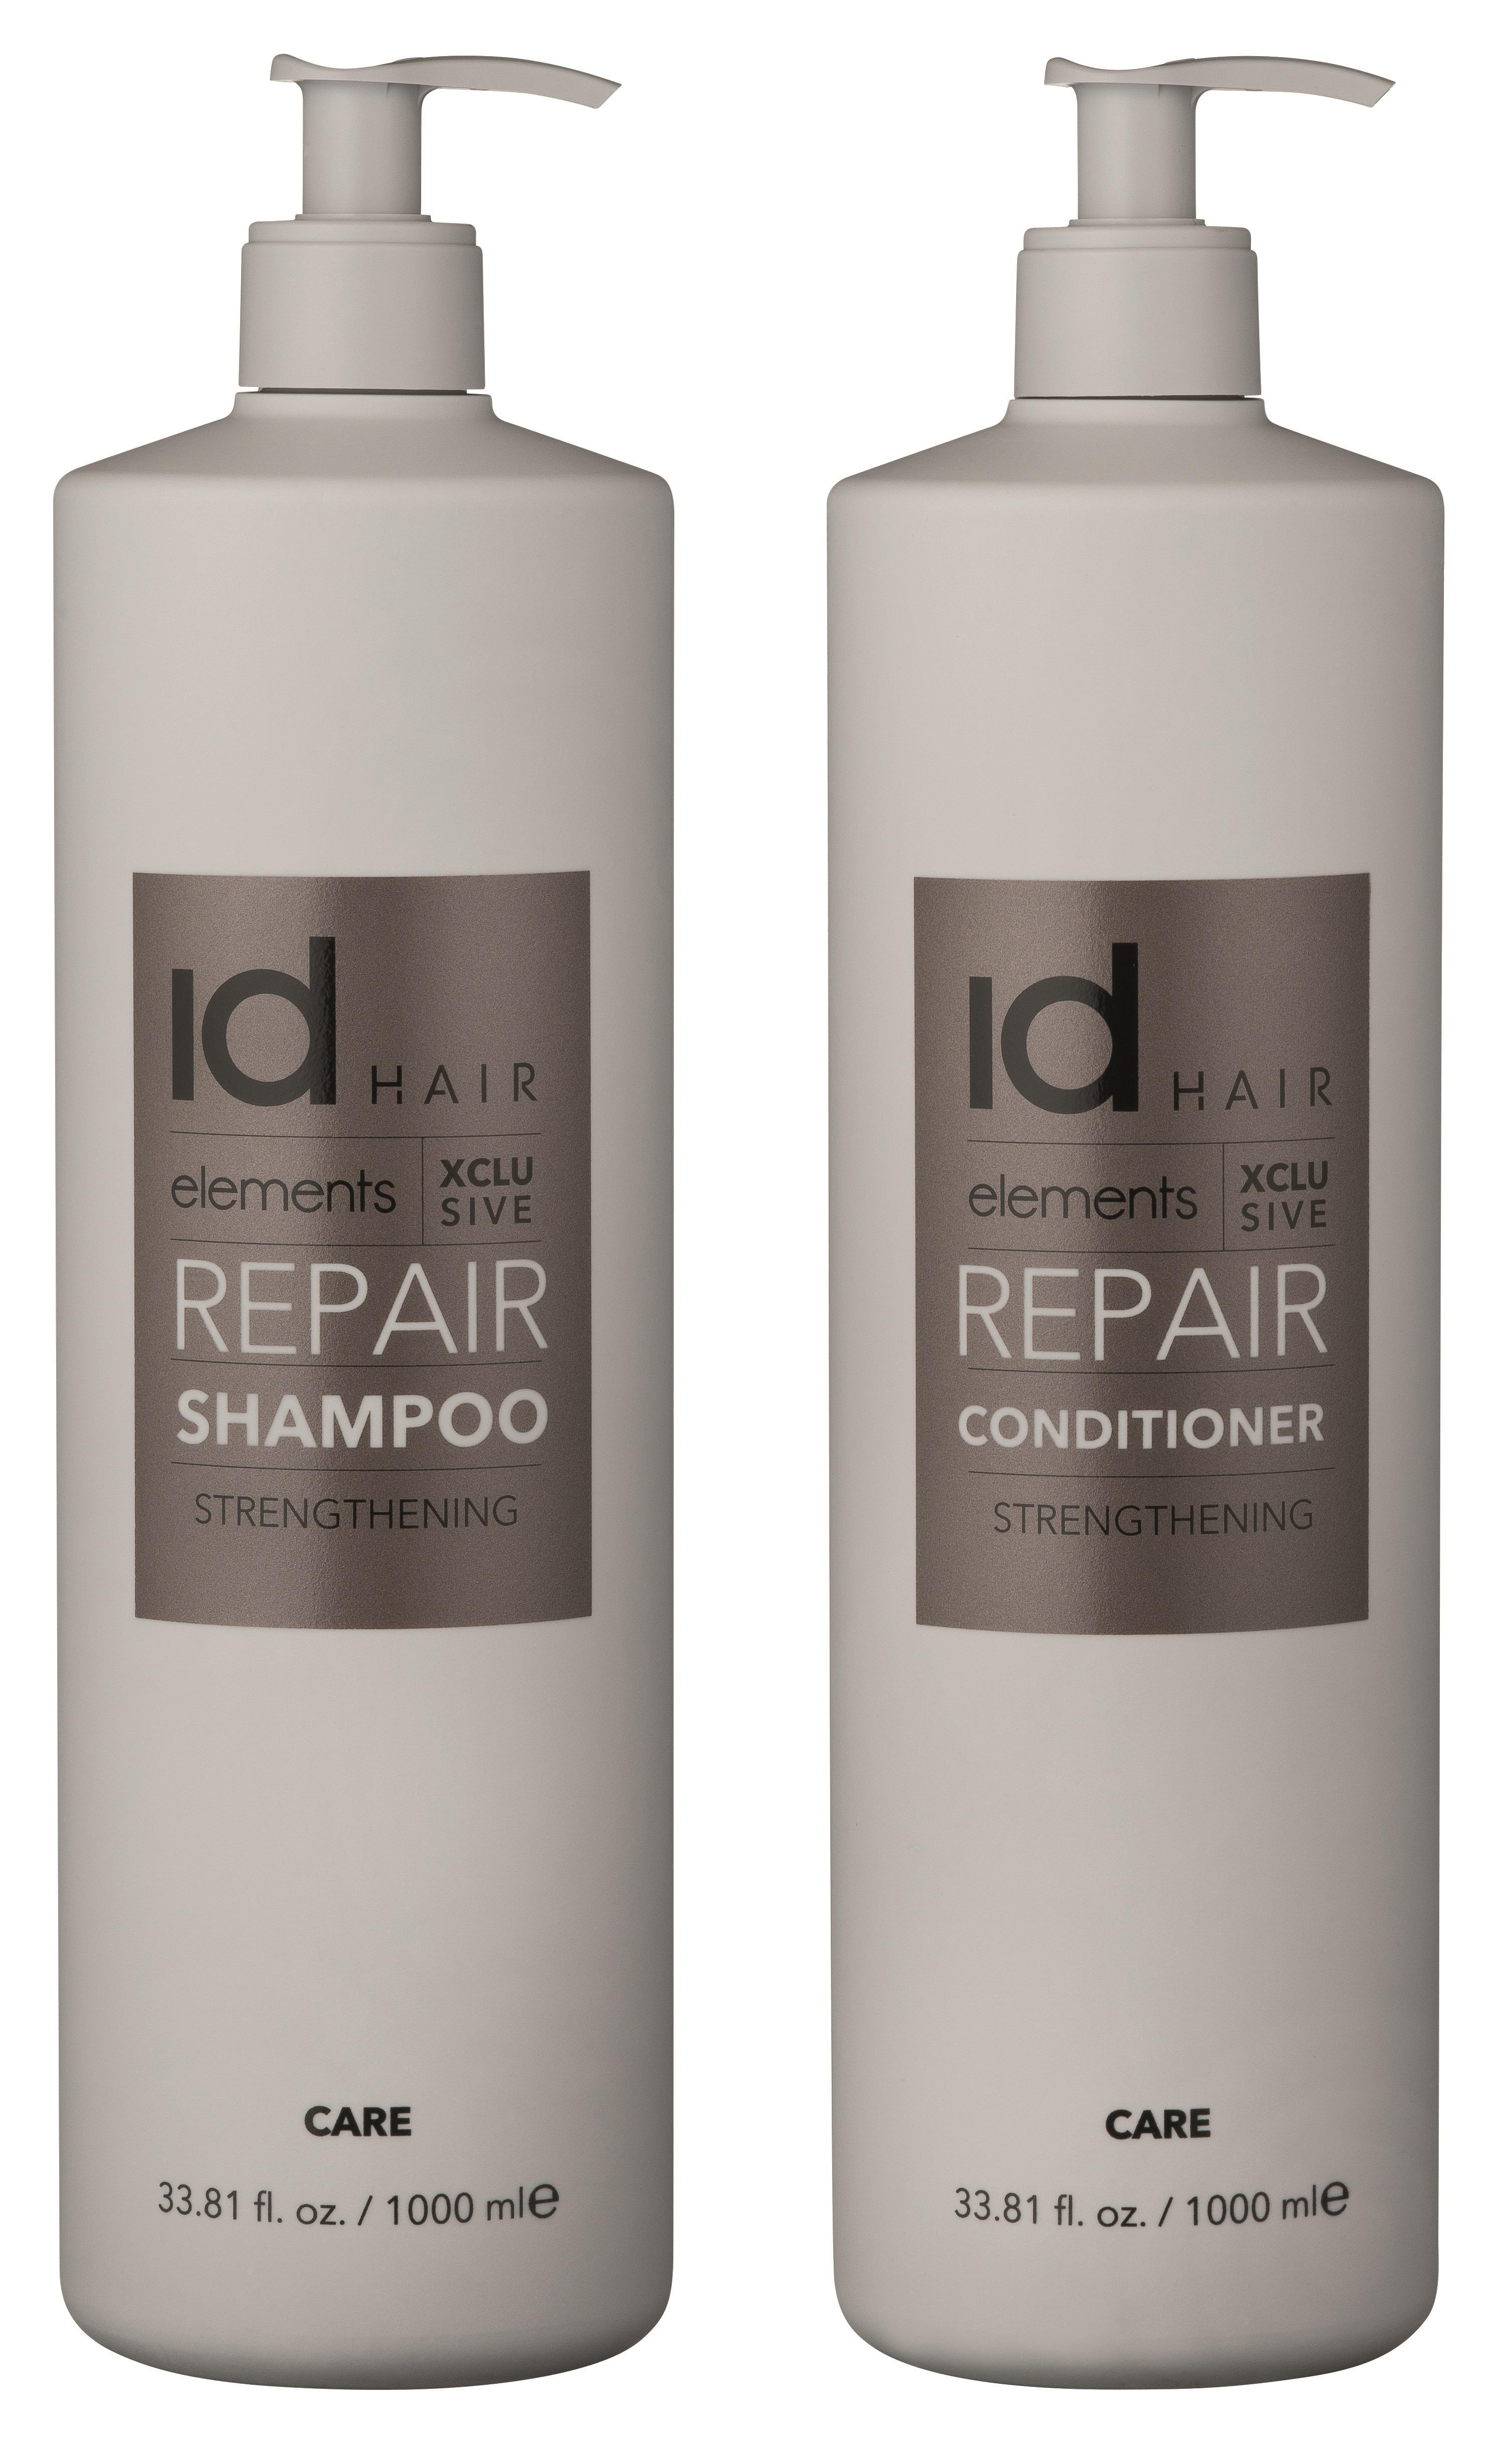 IdHAIR - Elements Xclusive Repair Shampoo 1000 ml + Conditioner 1000 ml